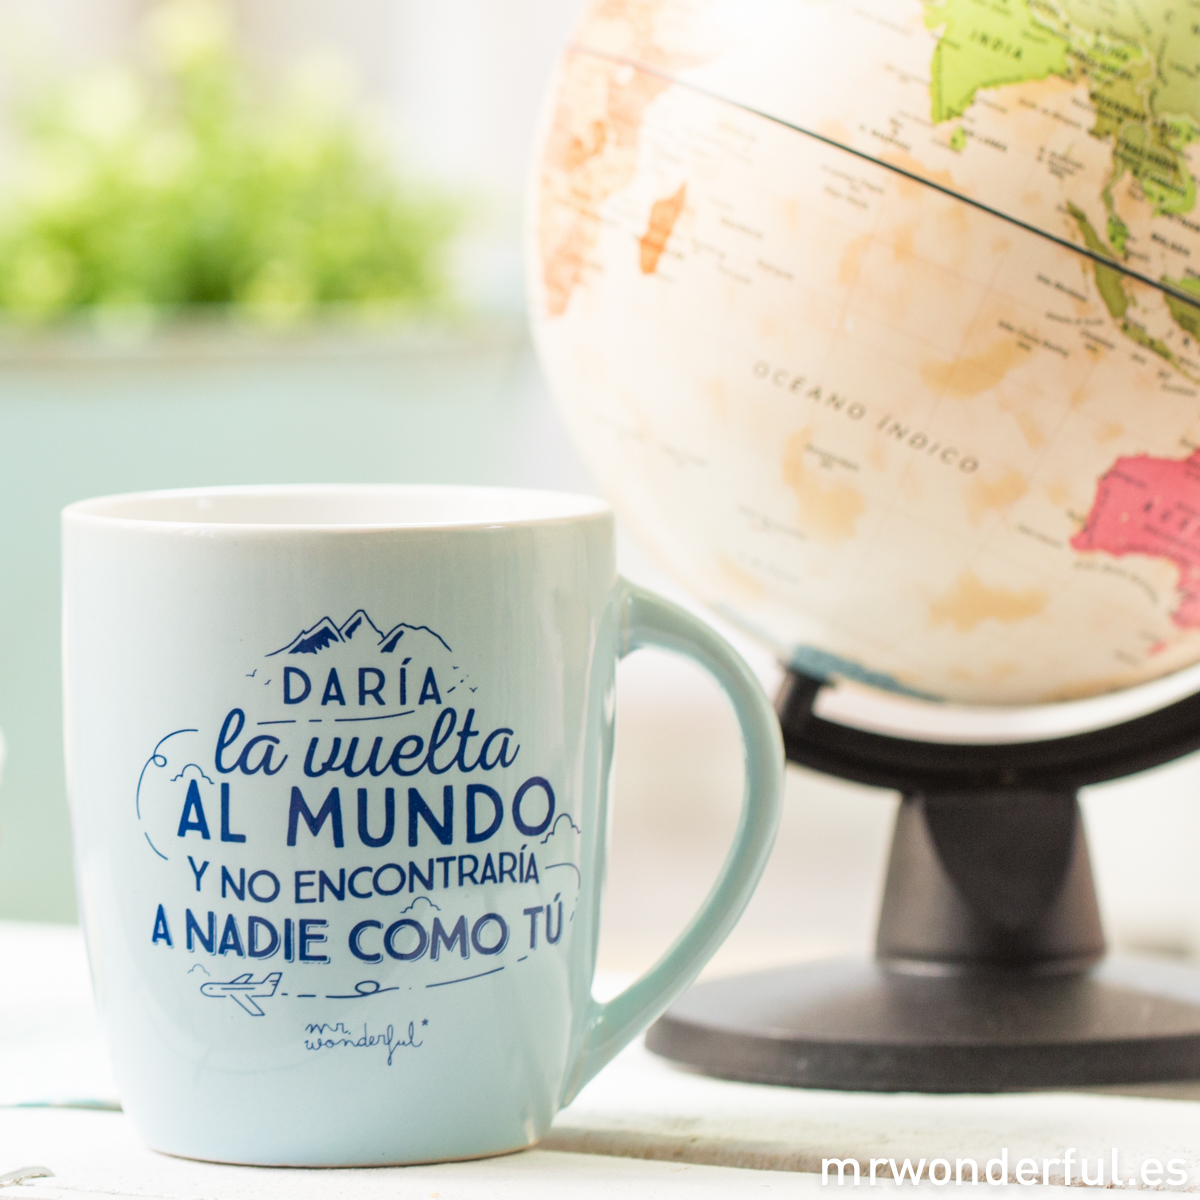 mrwonderful_8436547191642_WON-210_TAZA_Taza-pastel-AZUL_daria-la-vuelta-al-mundo-no-encontraria-nadie-como-tu-16